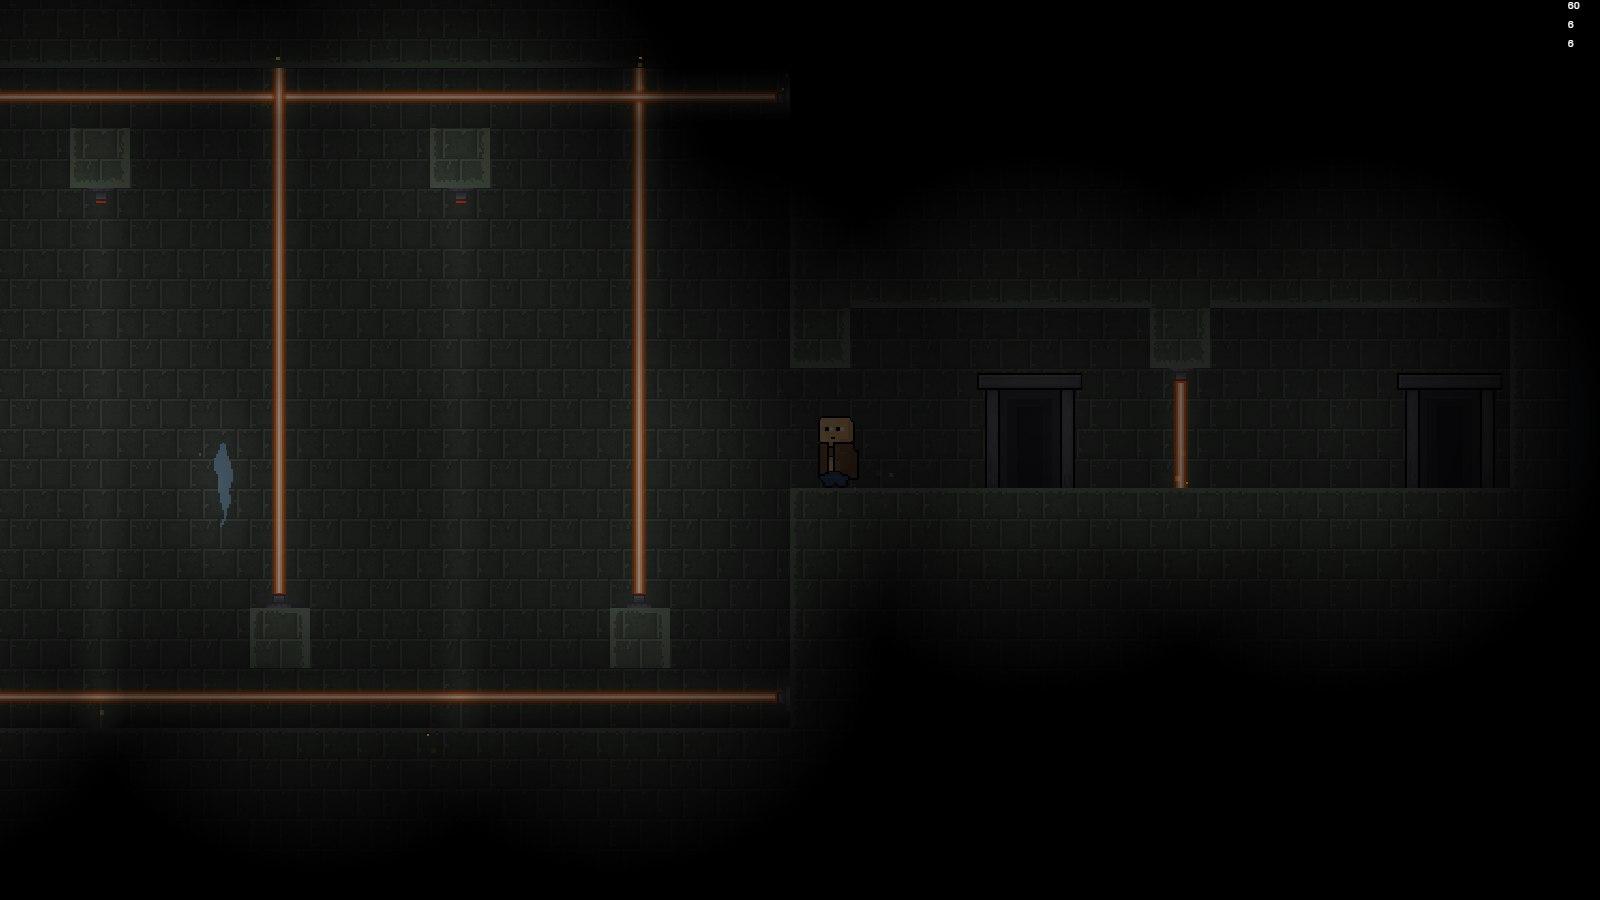 Inverted screenshot